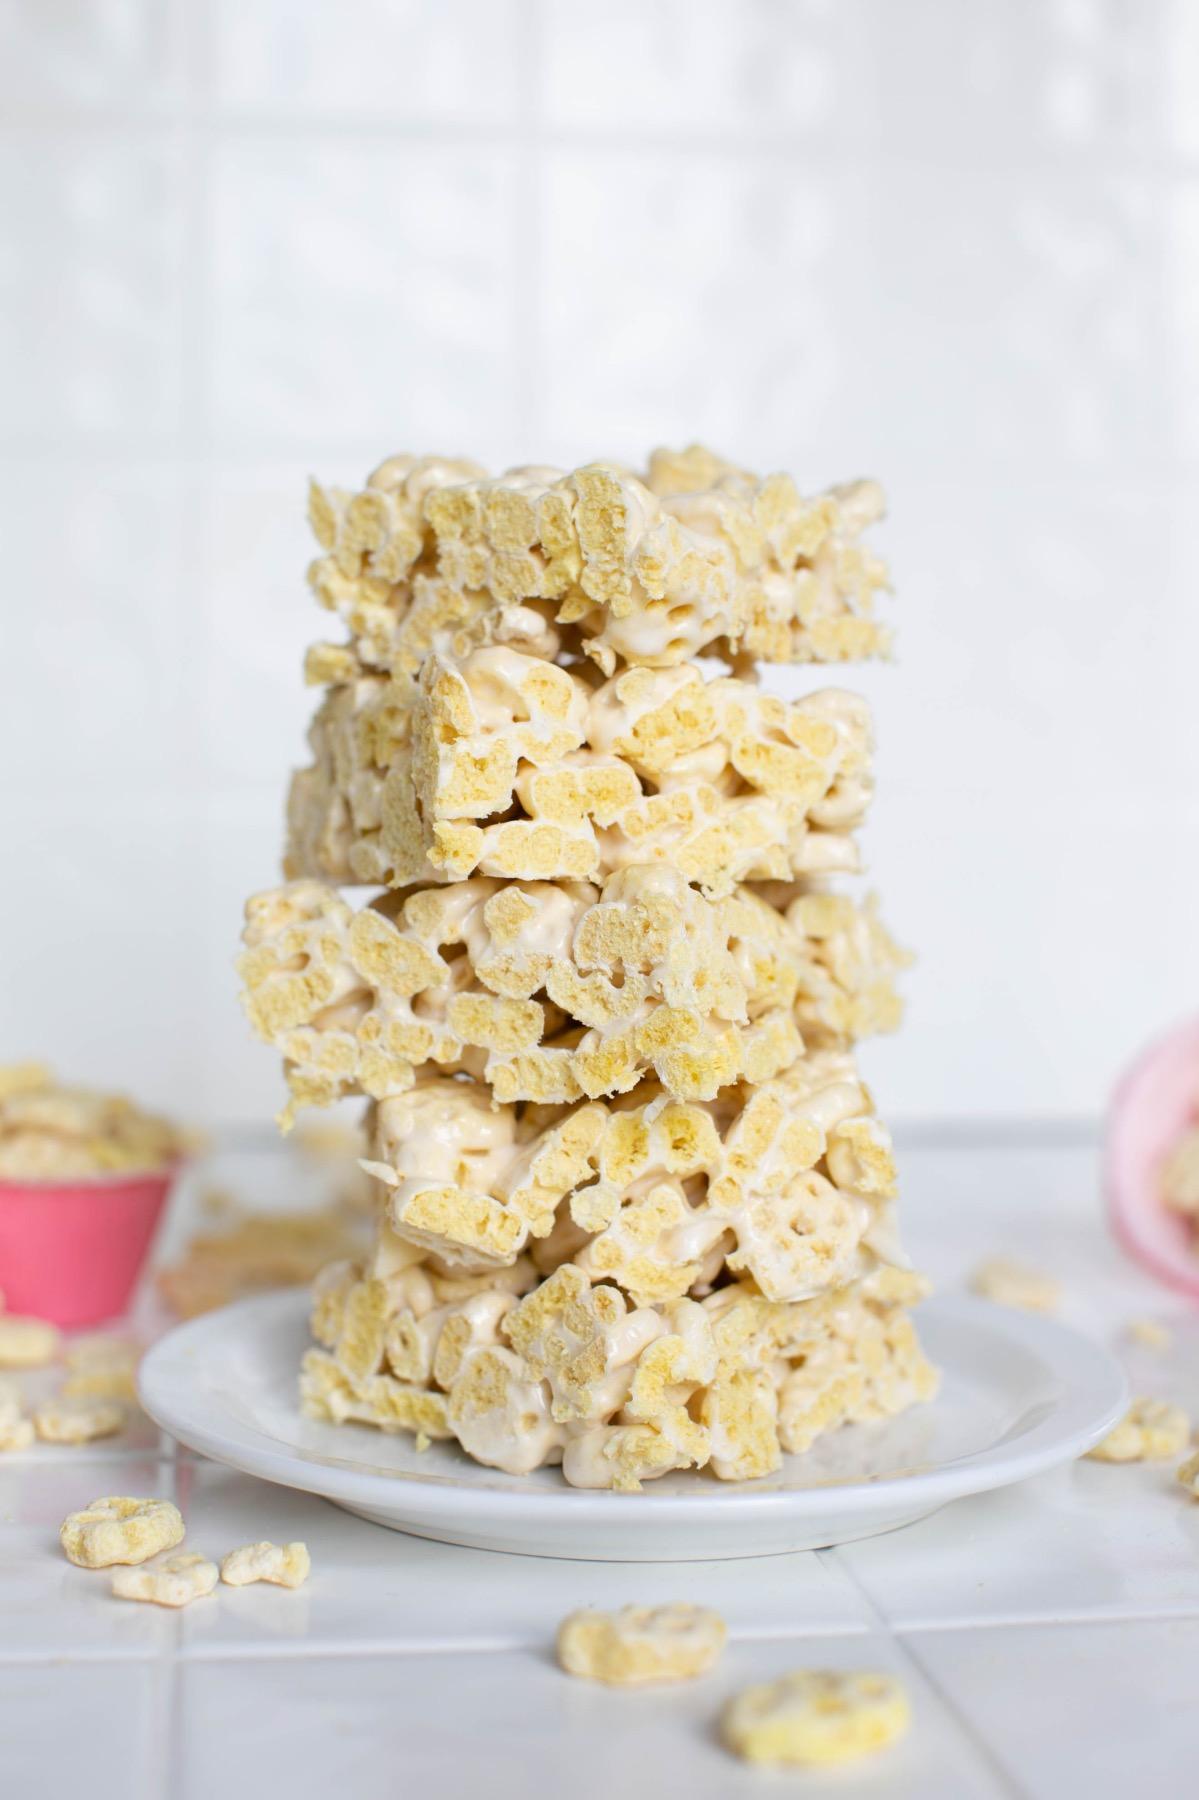 marshmallow treats with honeycomb cereal recipe